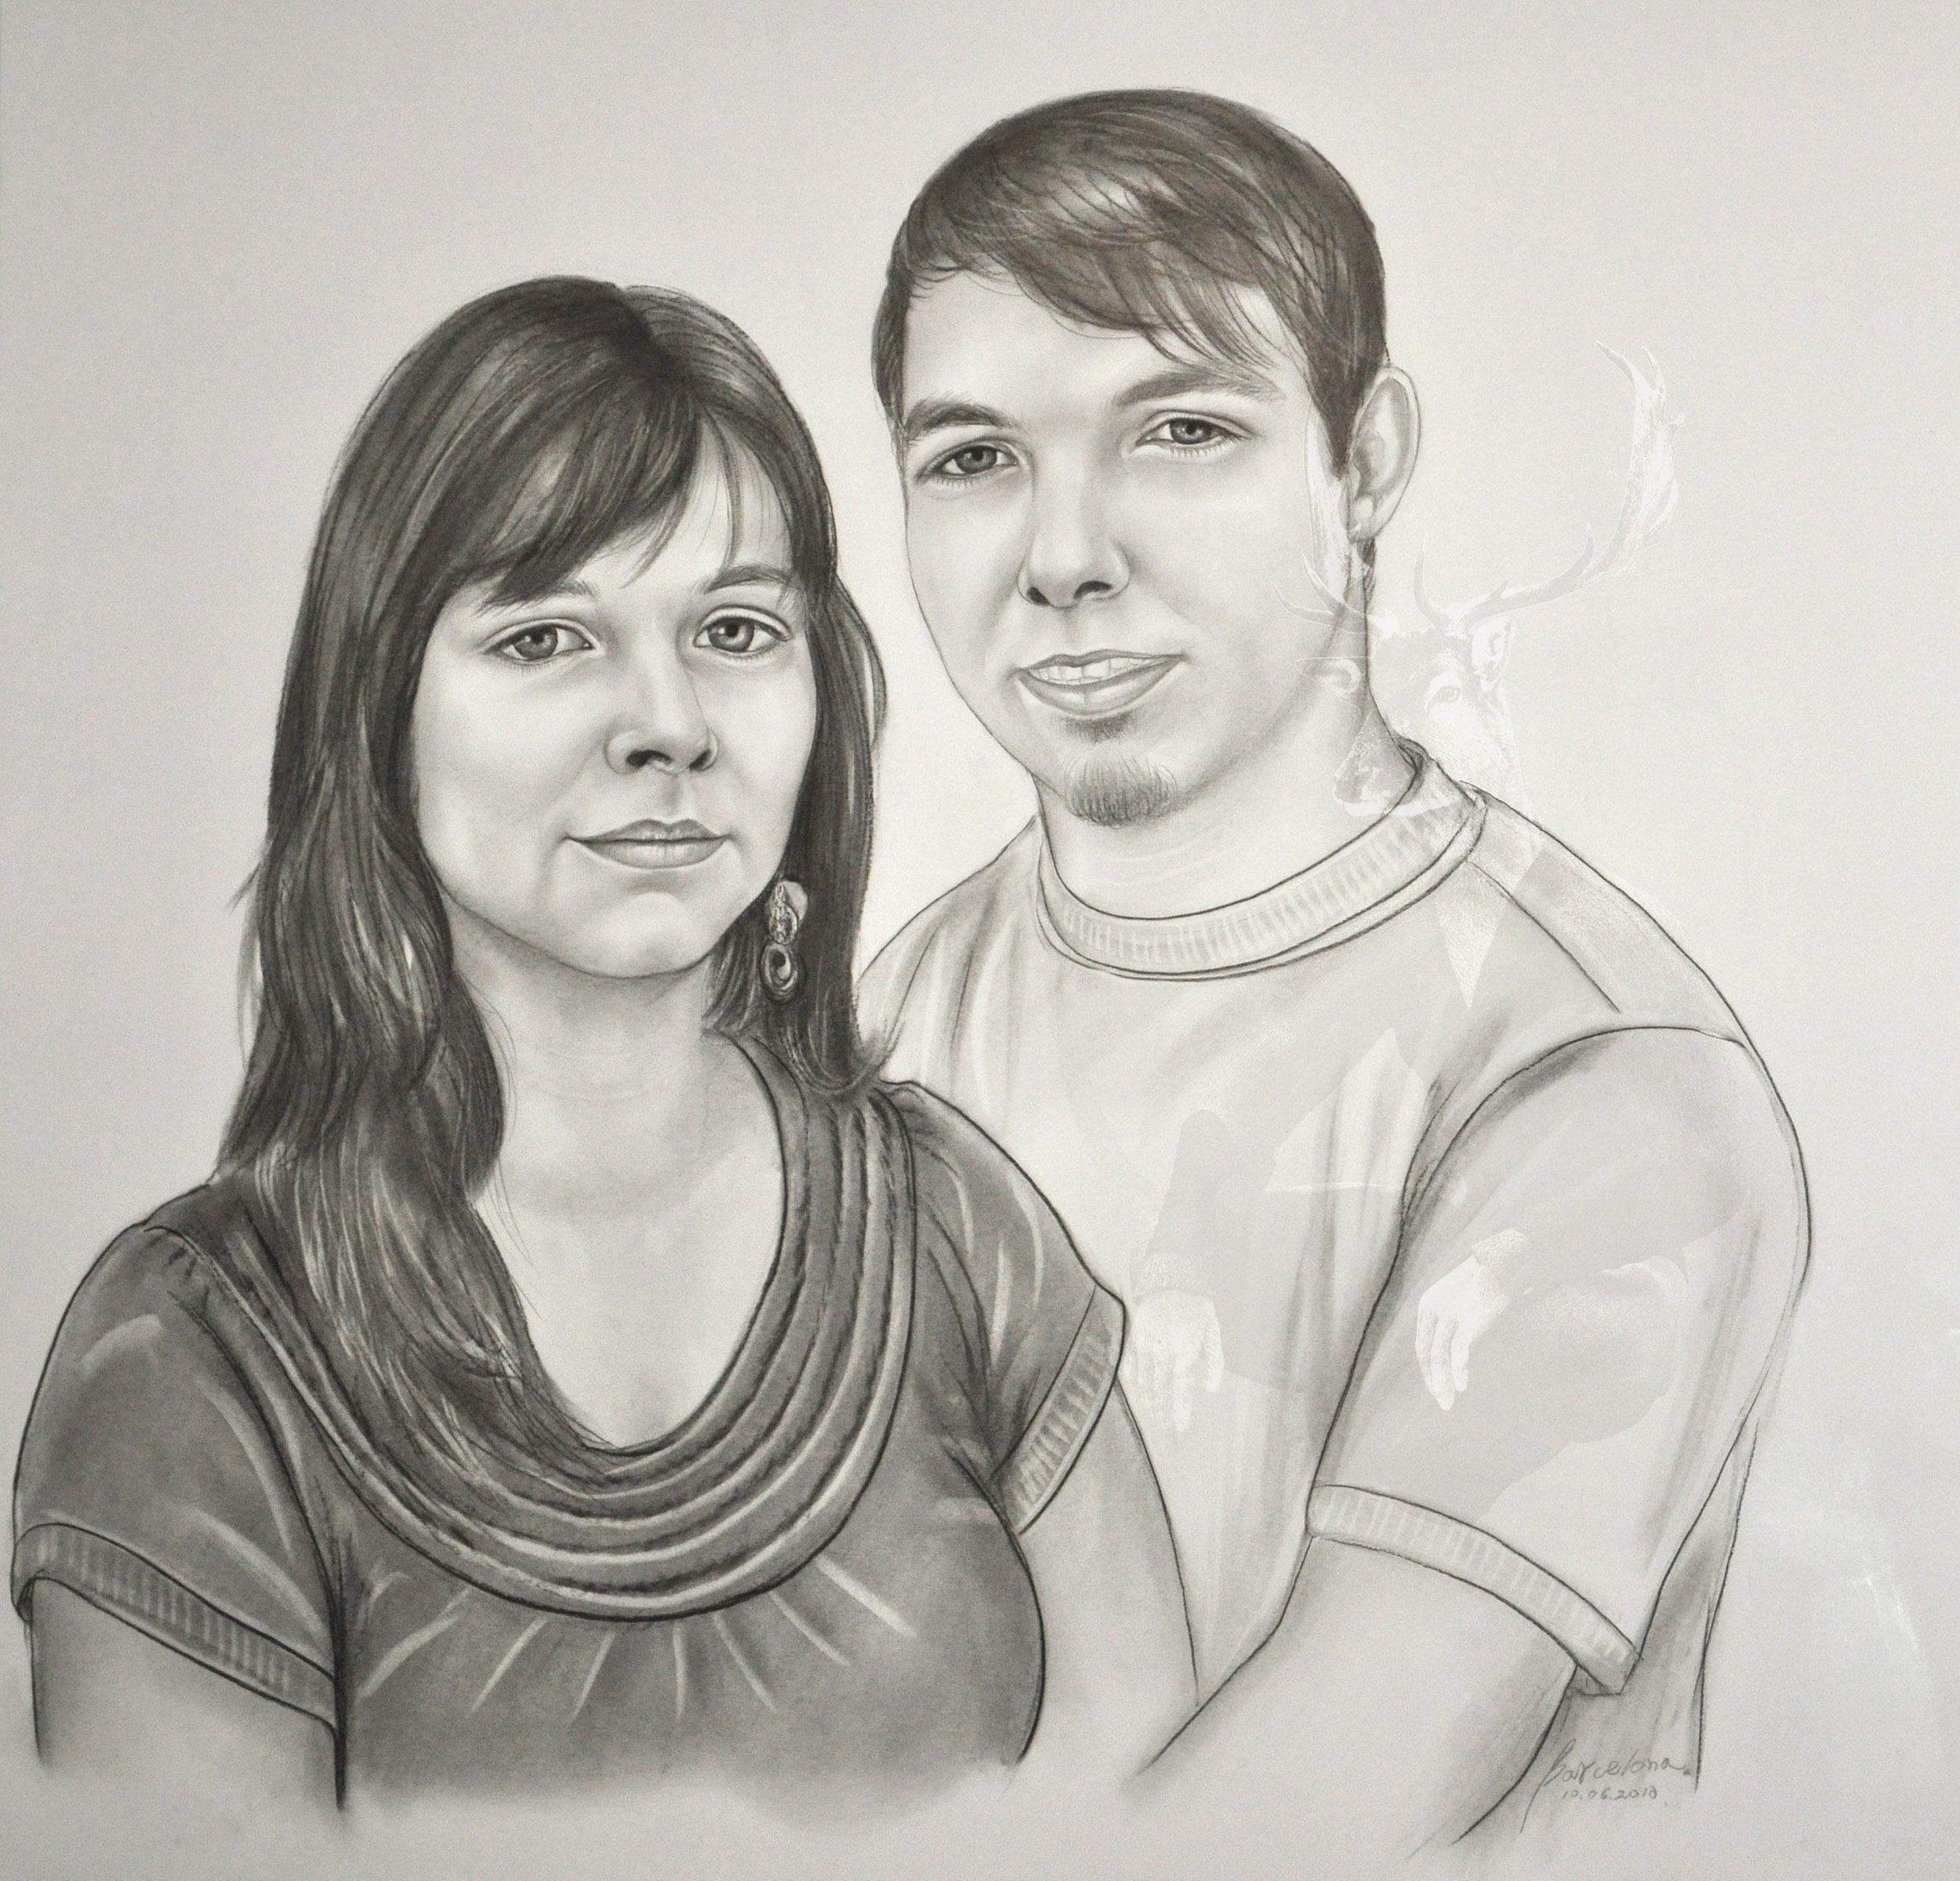 MWD; Contest; Portrait